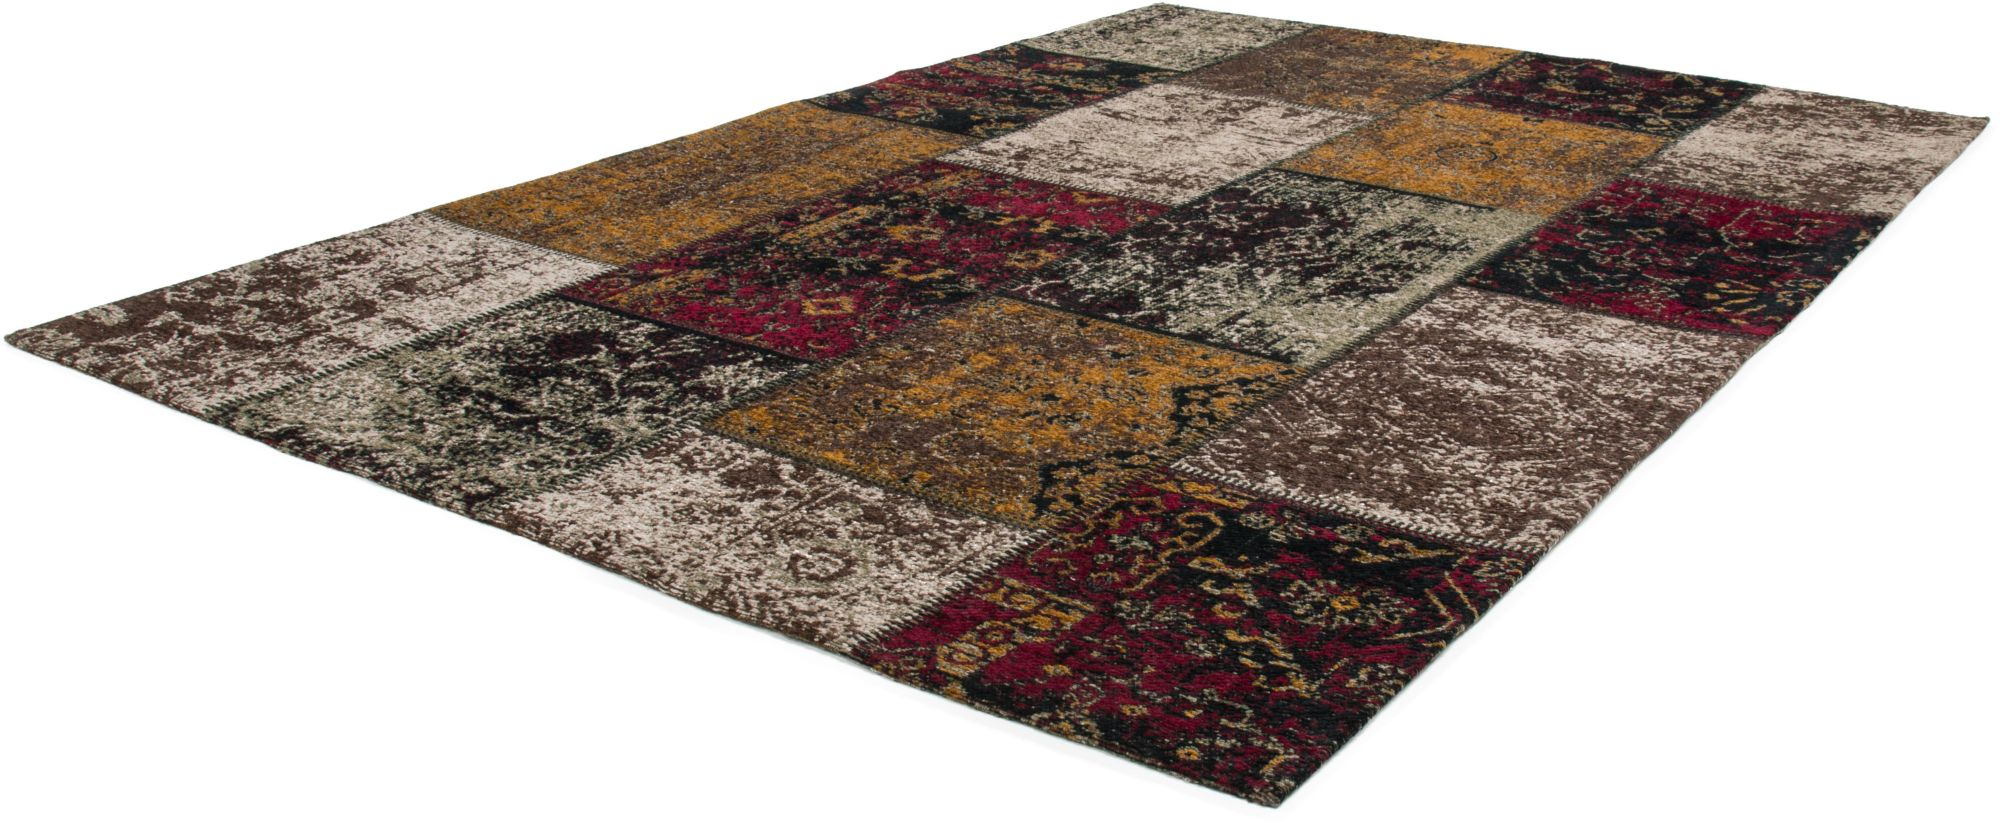 Teppich, »Cocoon990«, Lalee, rechteckig, Höhe 8 mm, handgewebt